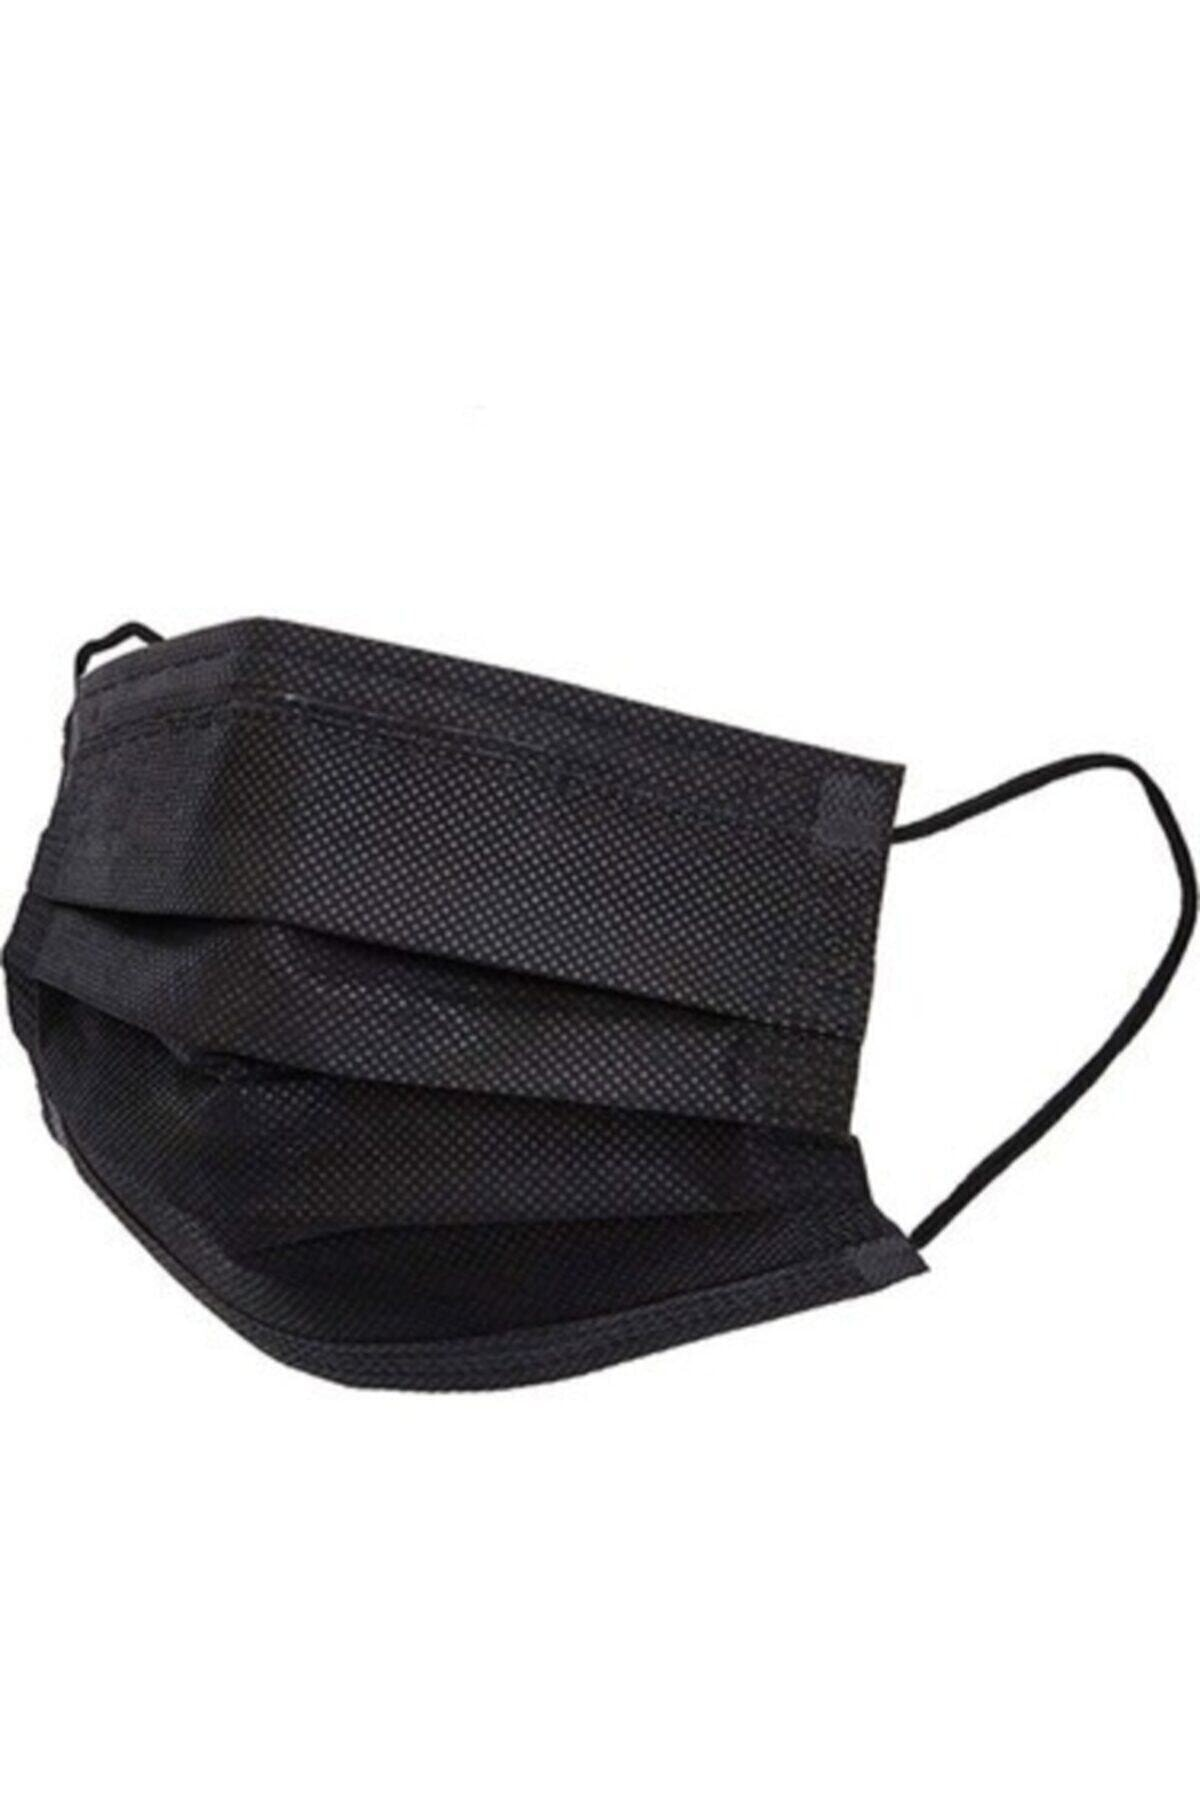 Medikal Maske Siyah Telli 3 Katlı Tam Ultrasonik Cerrahi Maske 50 Adet Afgtekmaskblack 1